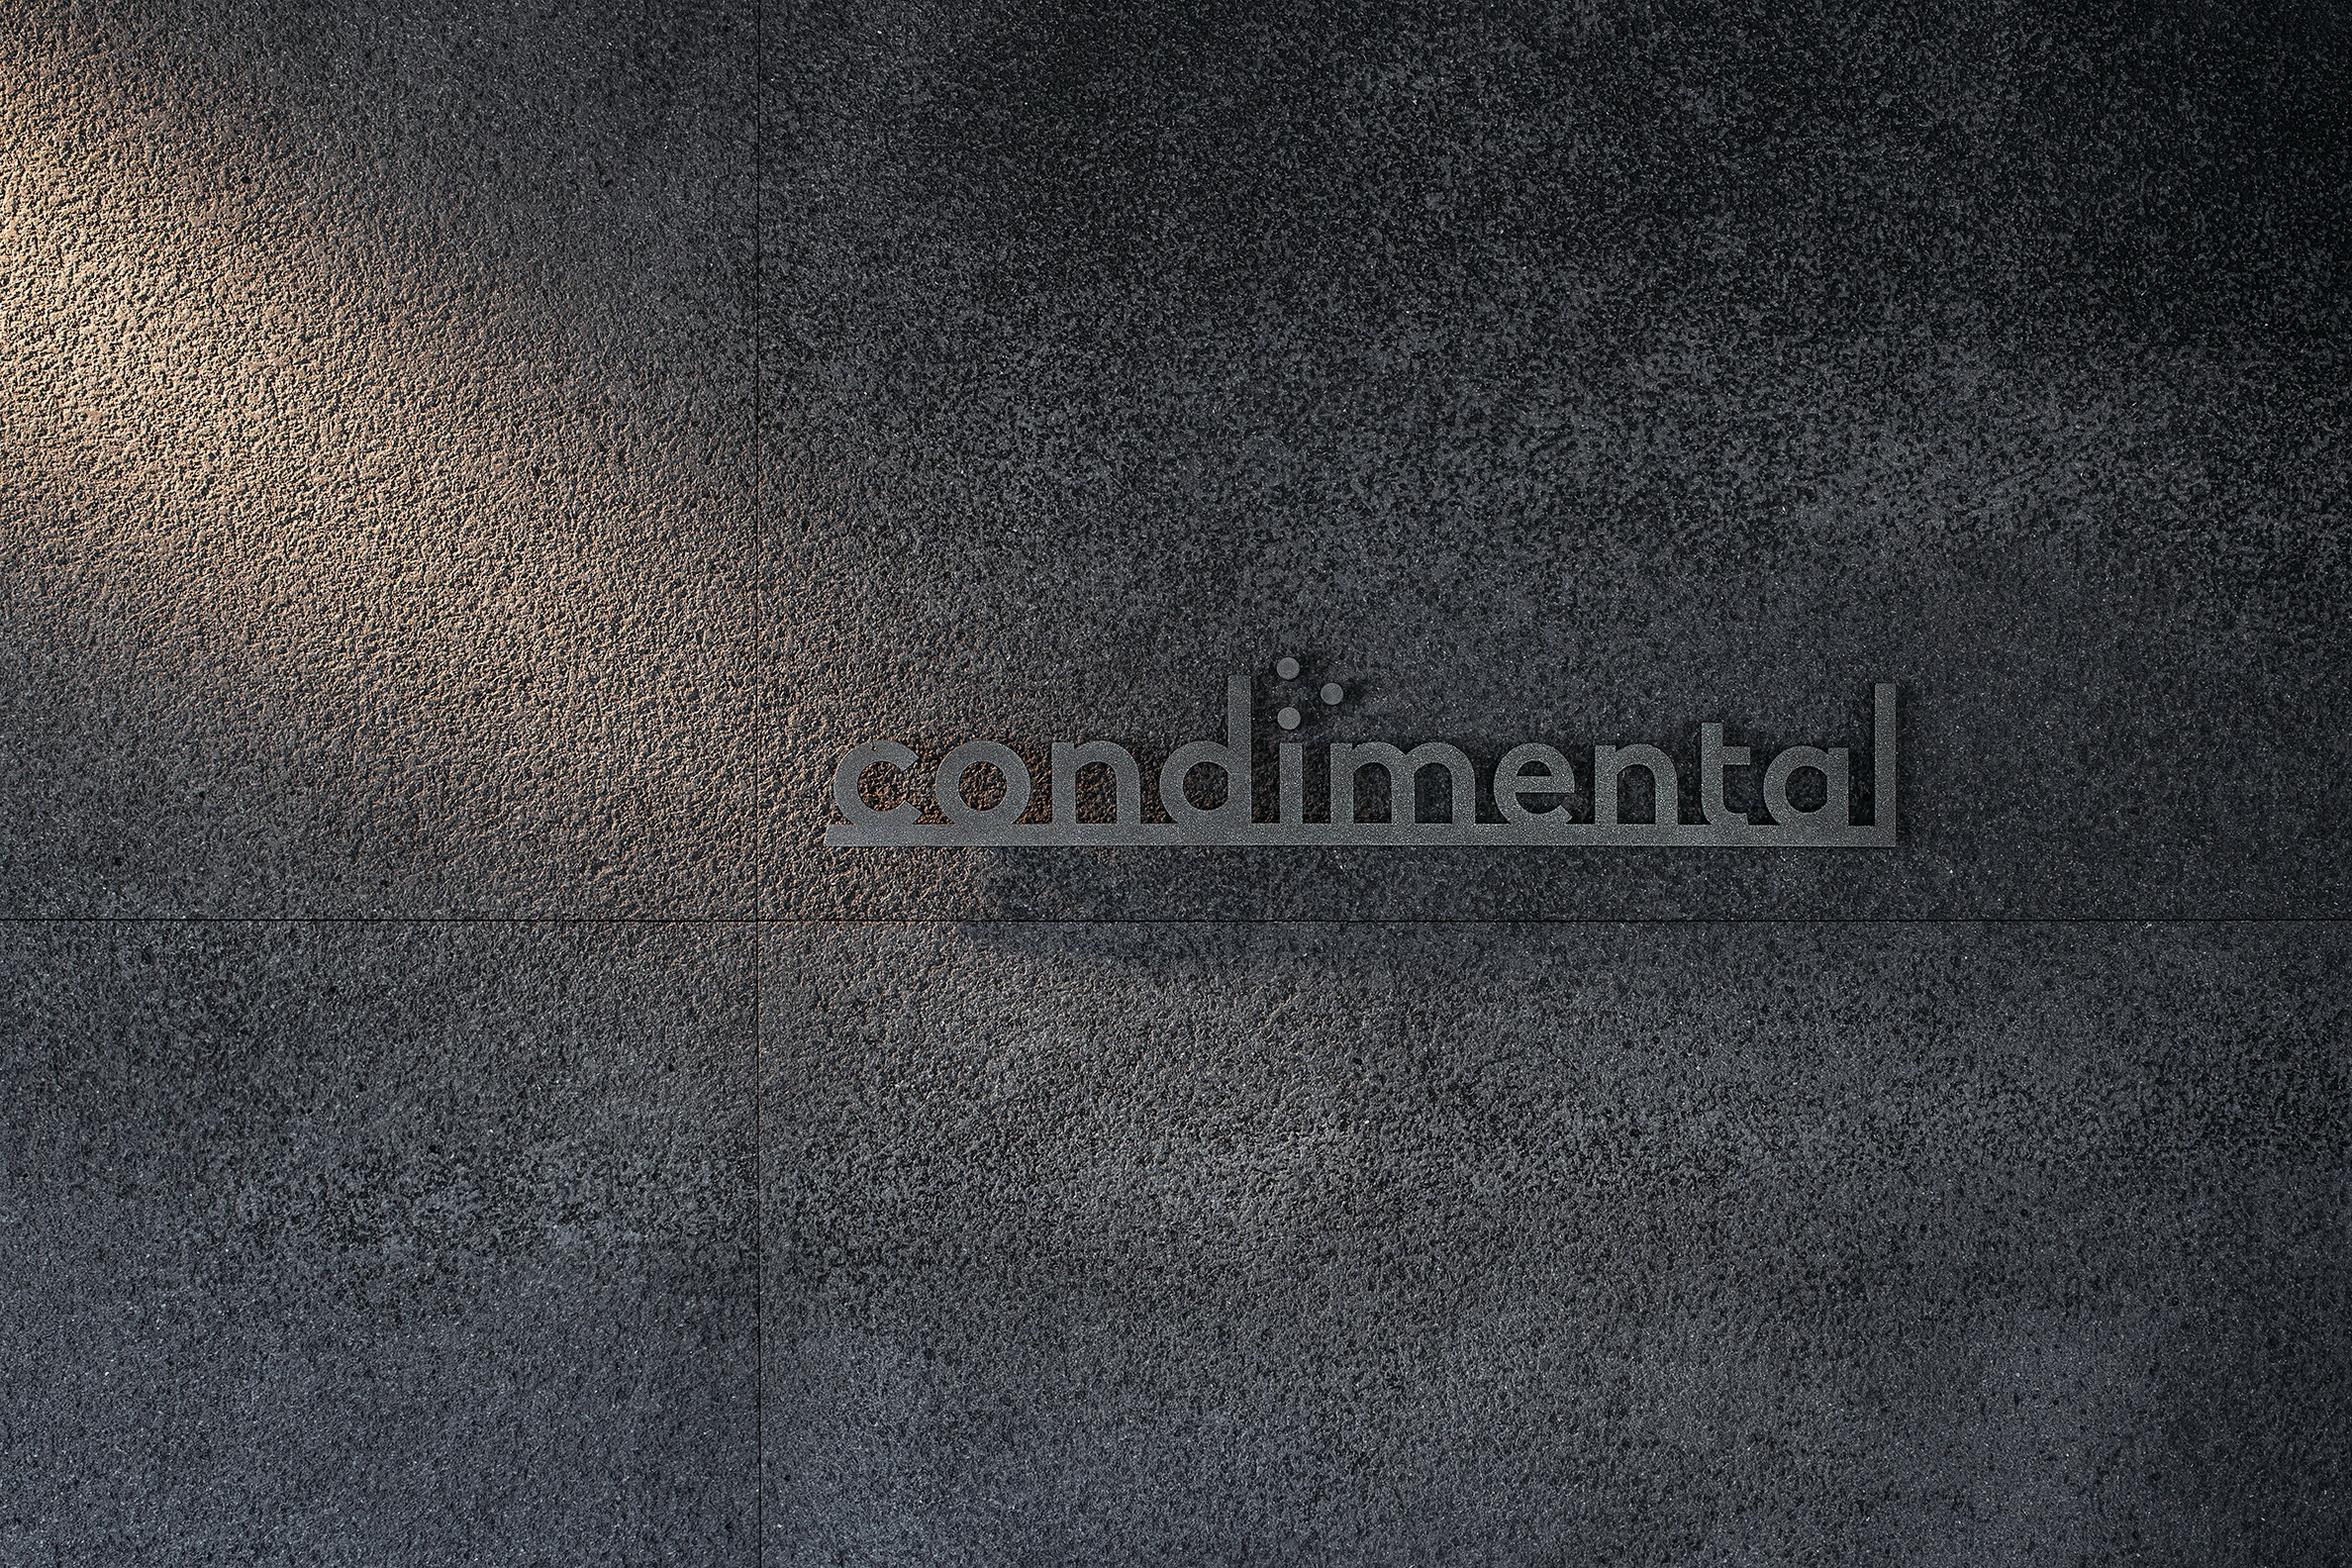 02Condimental